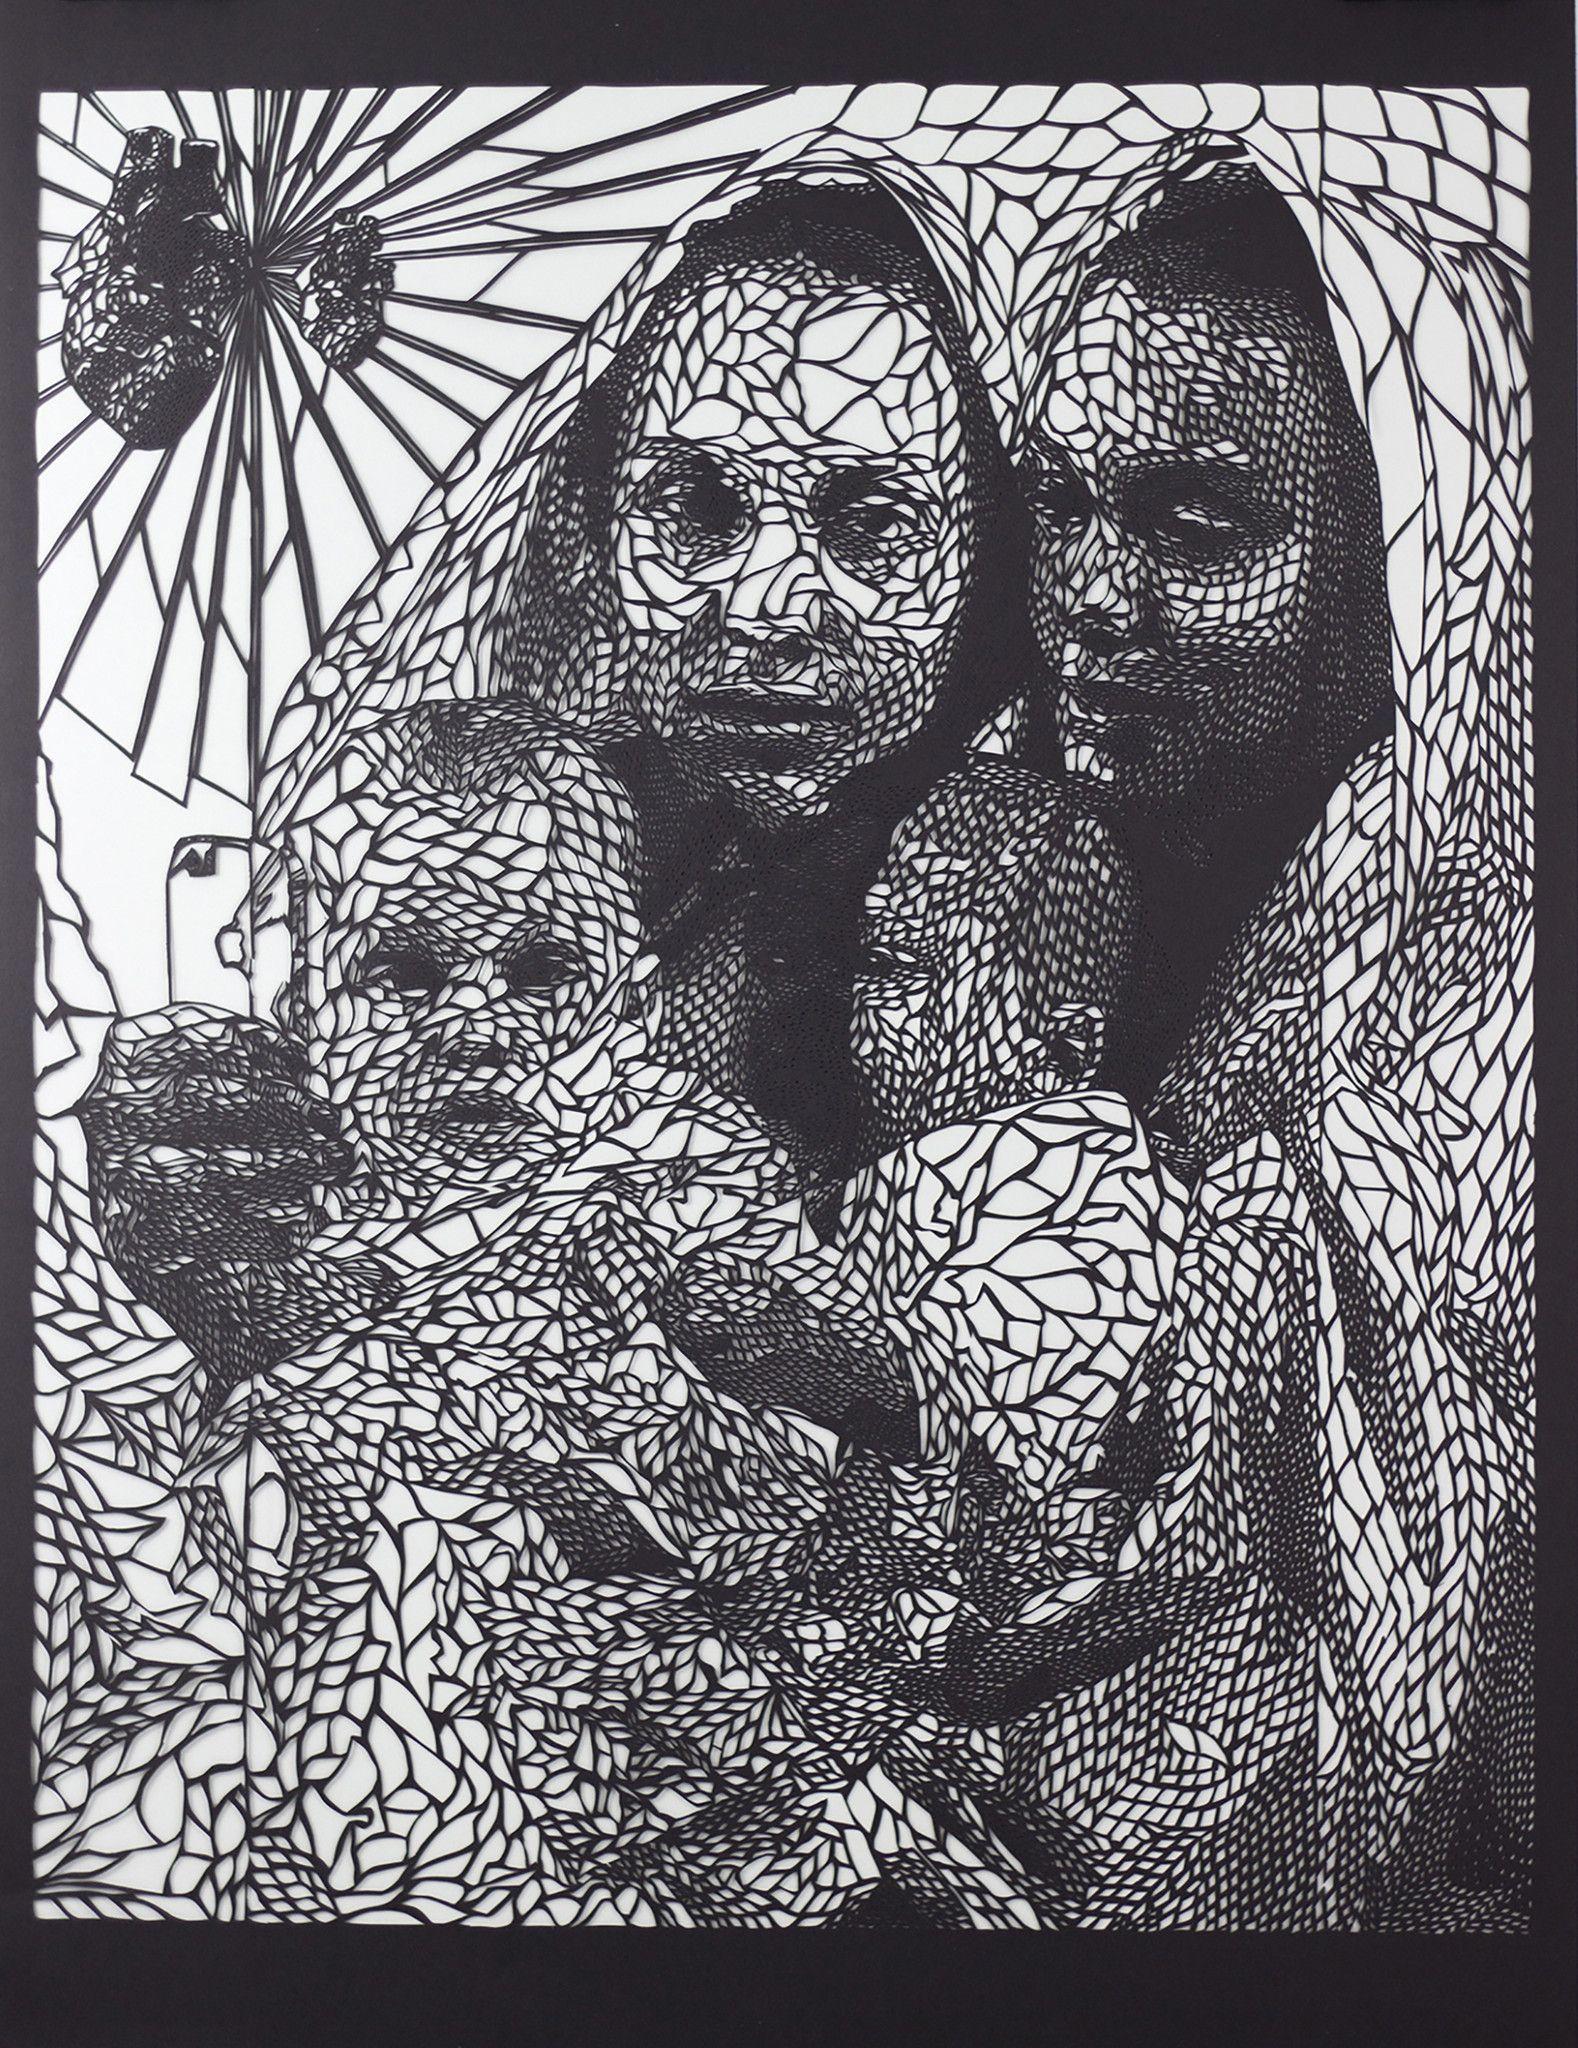 "Hand-cut paper 18"" x 24"" framed By Carlo Fantin"